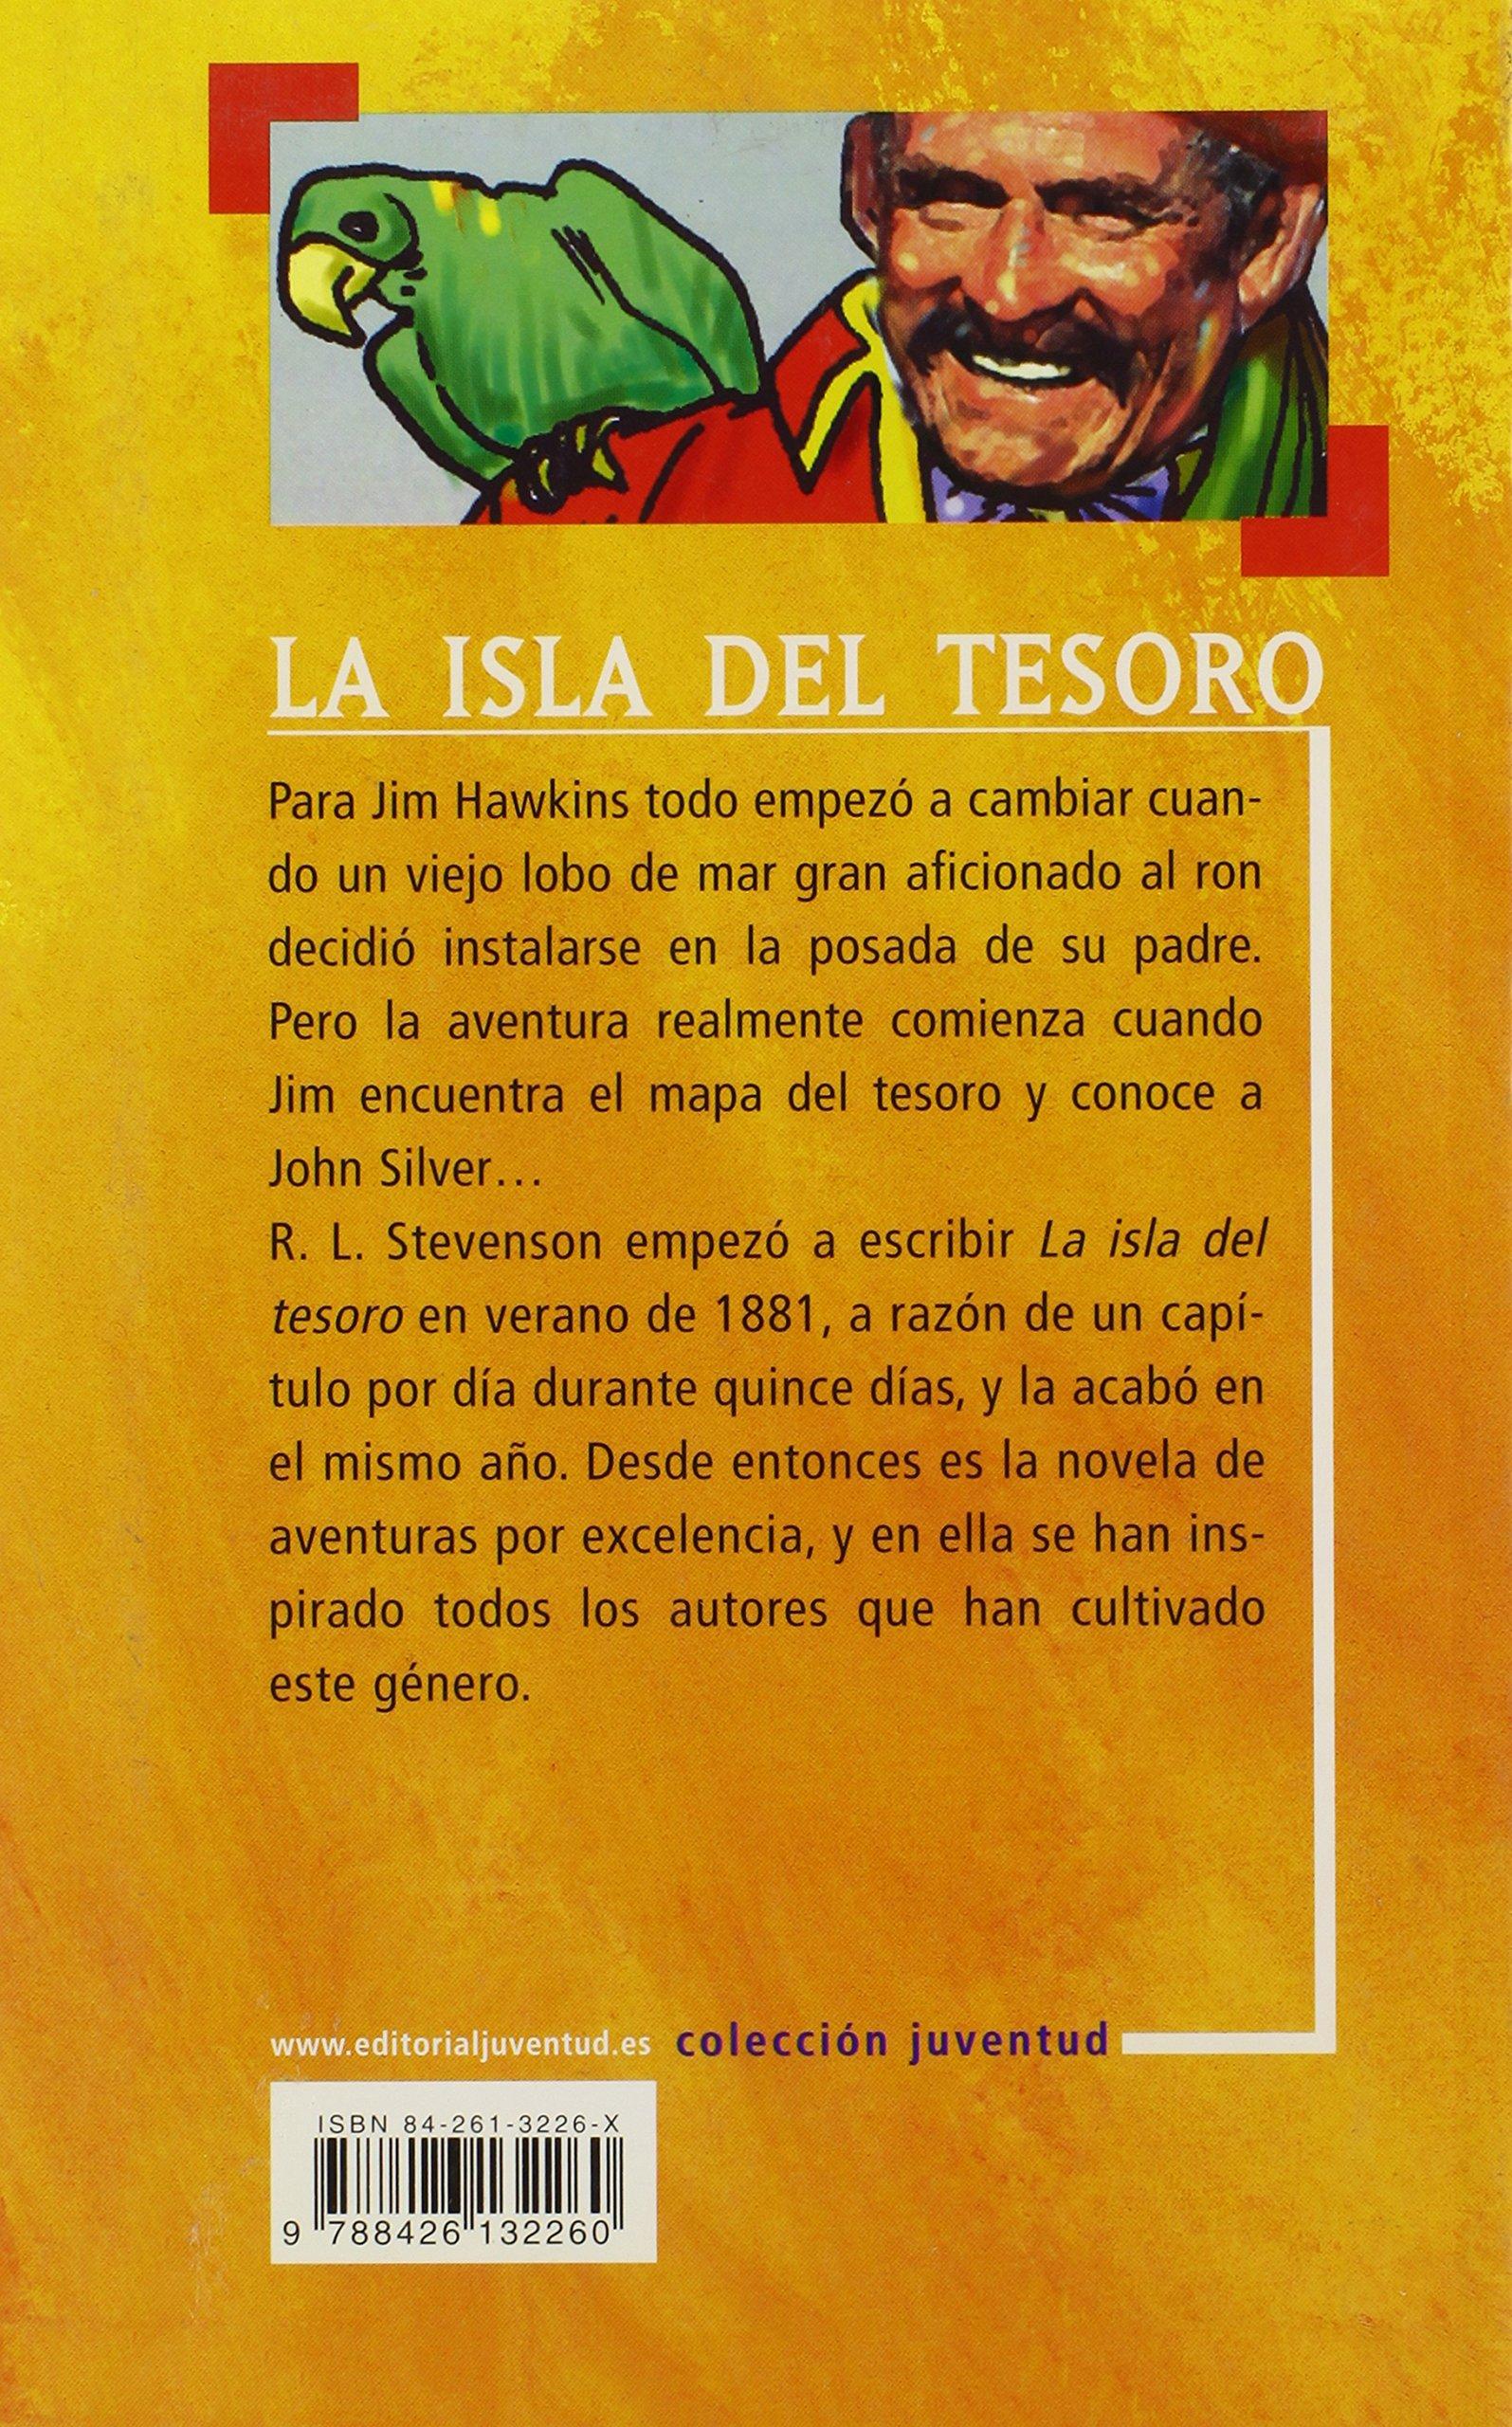 La isla del tesoro (COLECCION JUVENTUD): Amazon.es: Stevenson ...